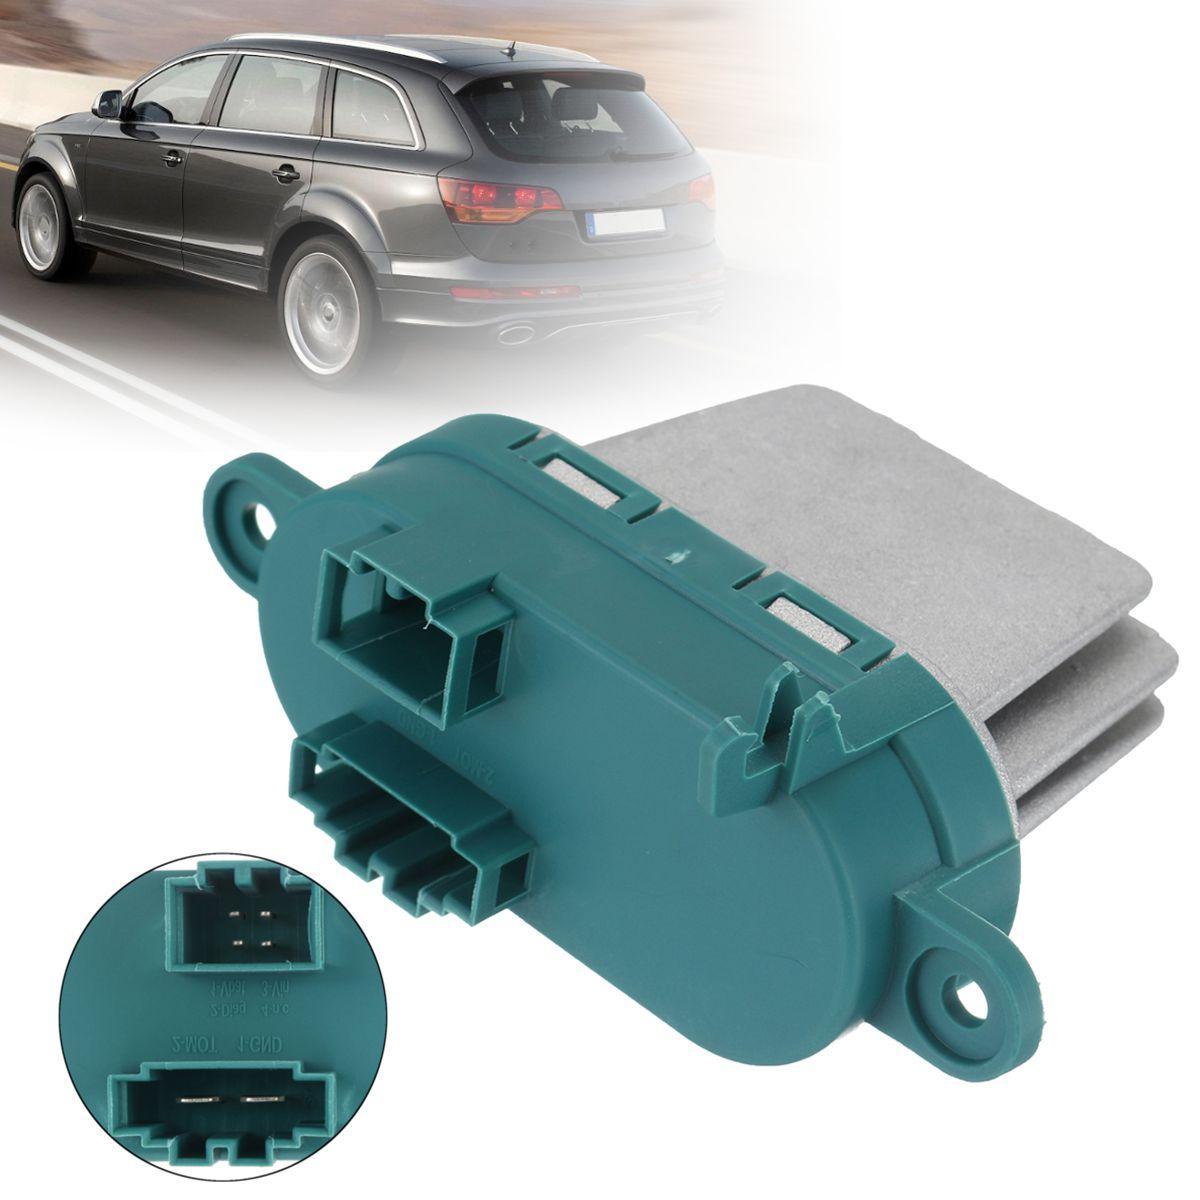 #7L0907521B Transporter Blower Fan Motor Heater Resistor Speed Controller For Audi/VW/Porsche Q7 Cayenne Amarok Multivan Touareg